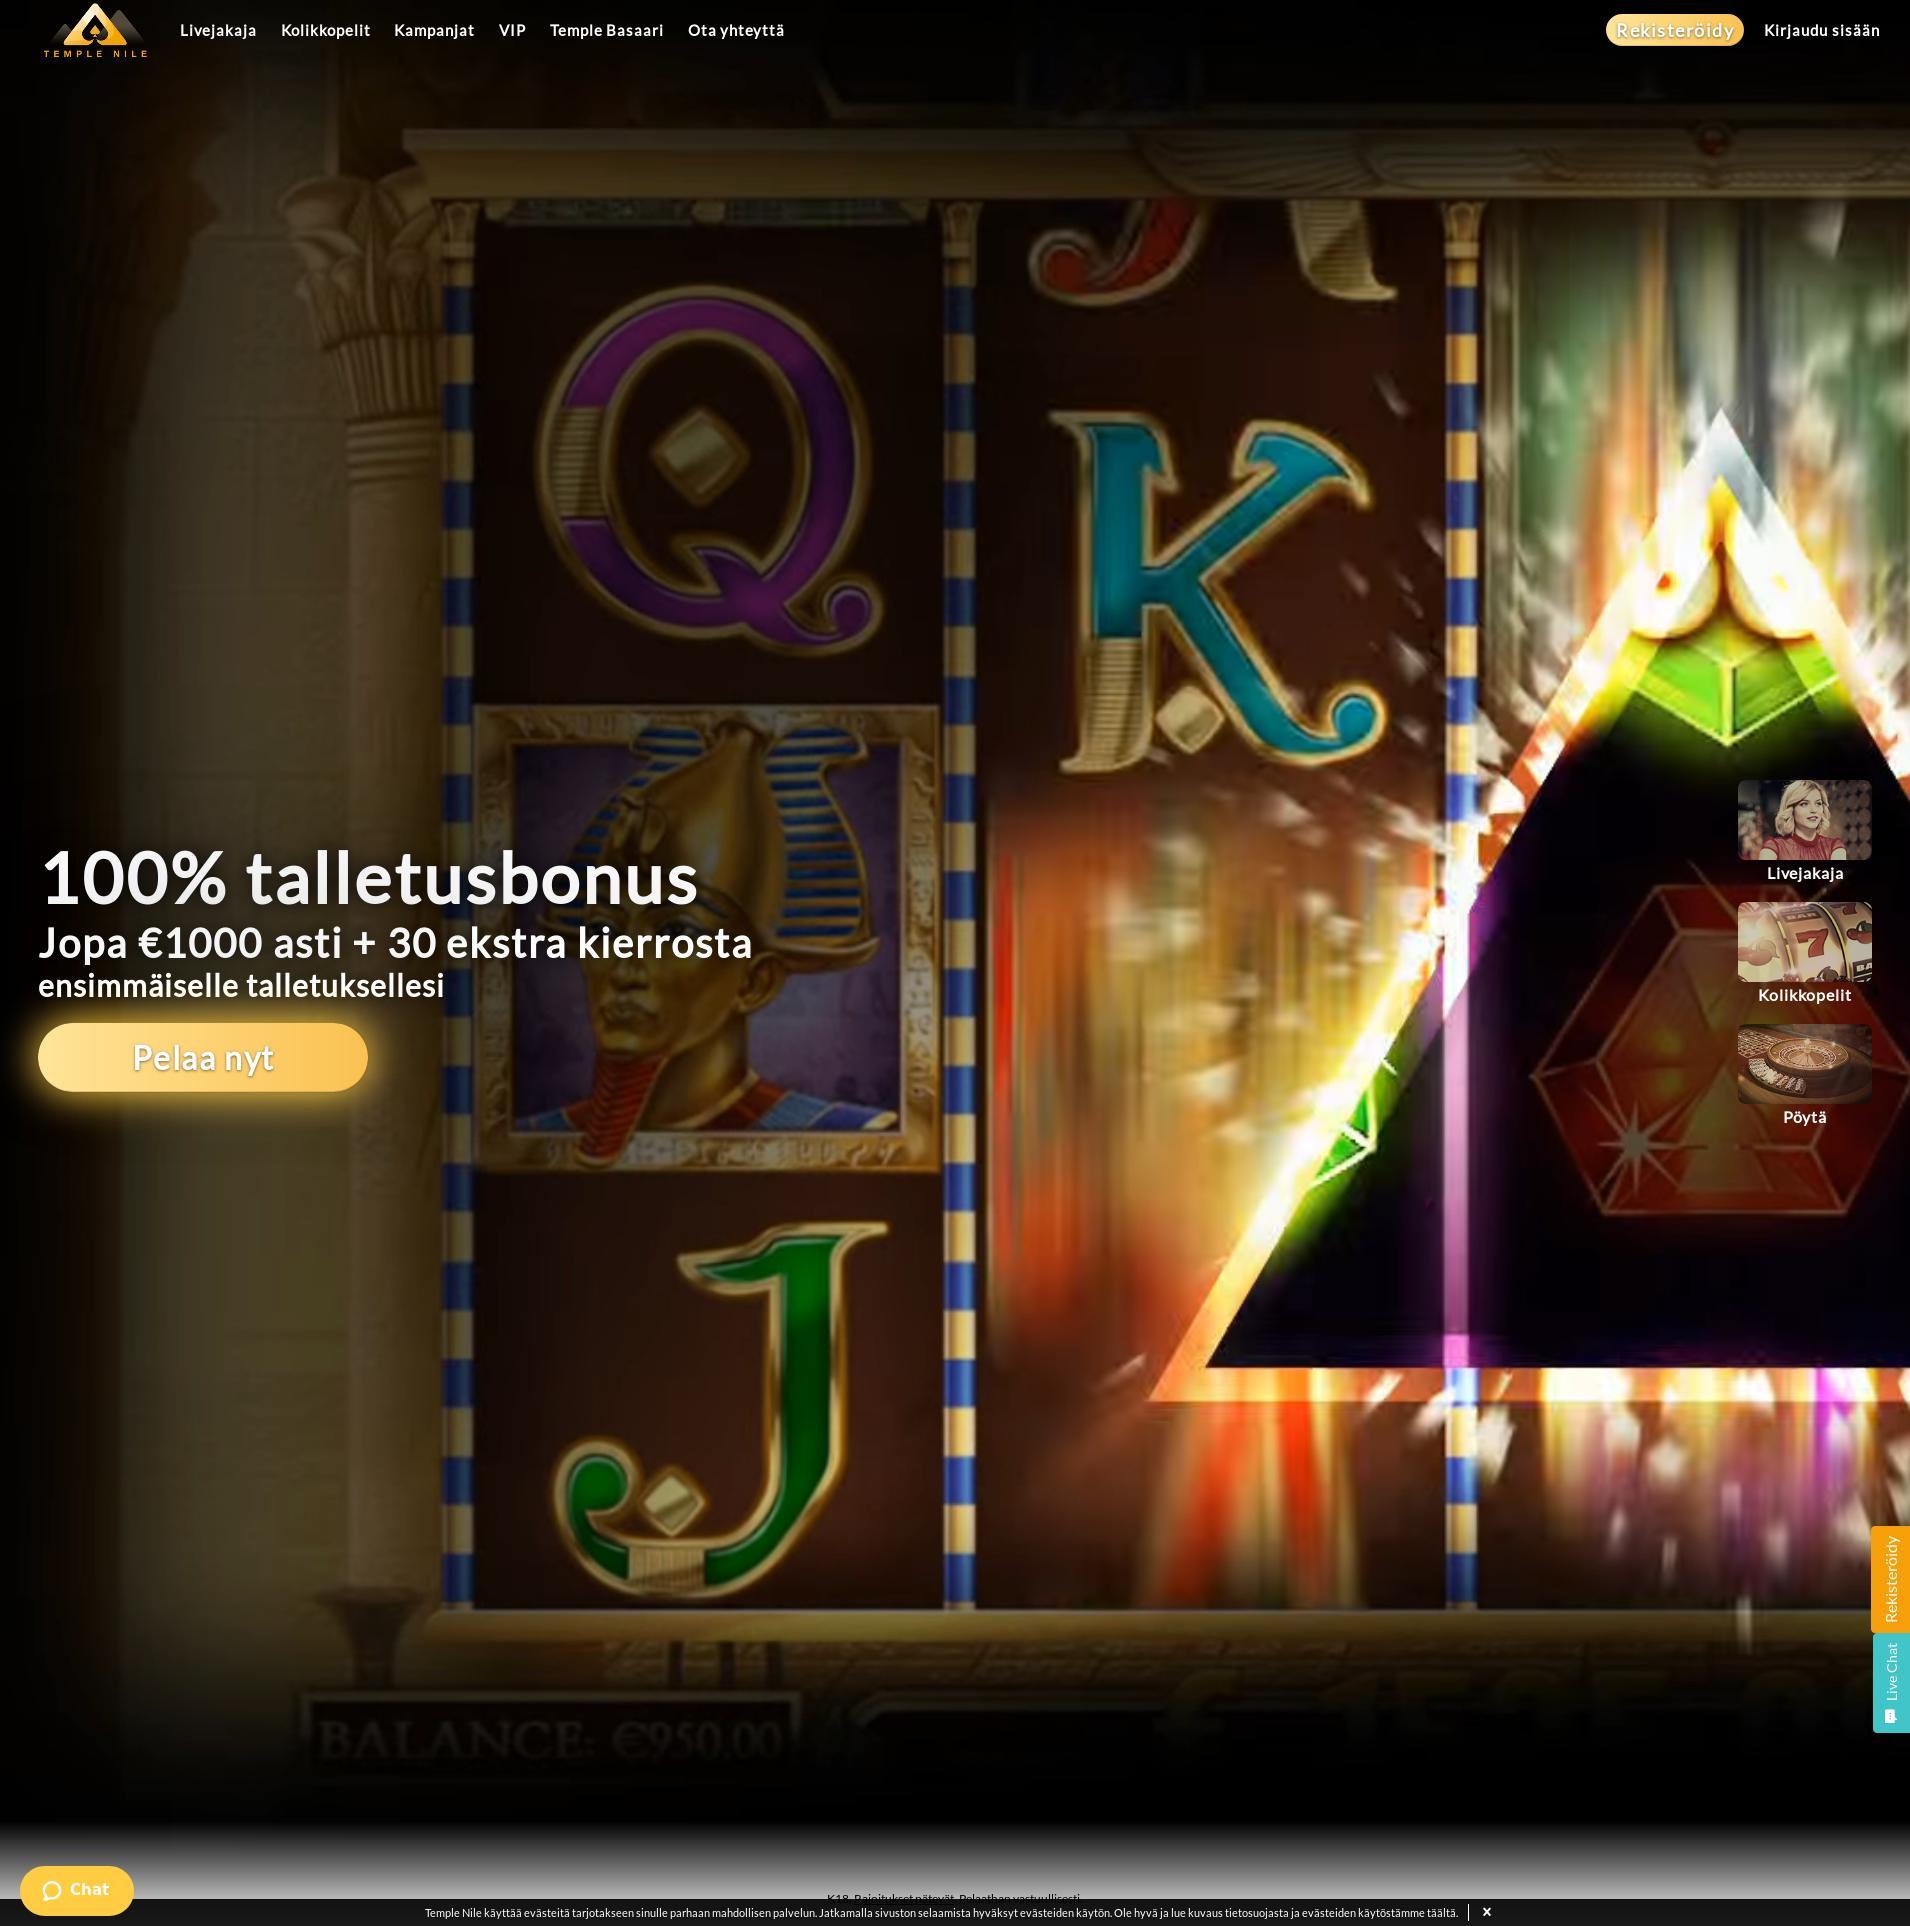 Casino screen Lobby 2019-06-15 for Finland